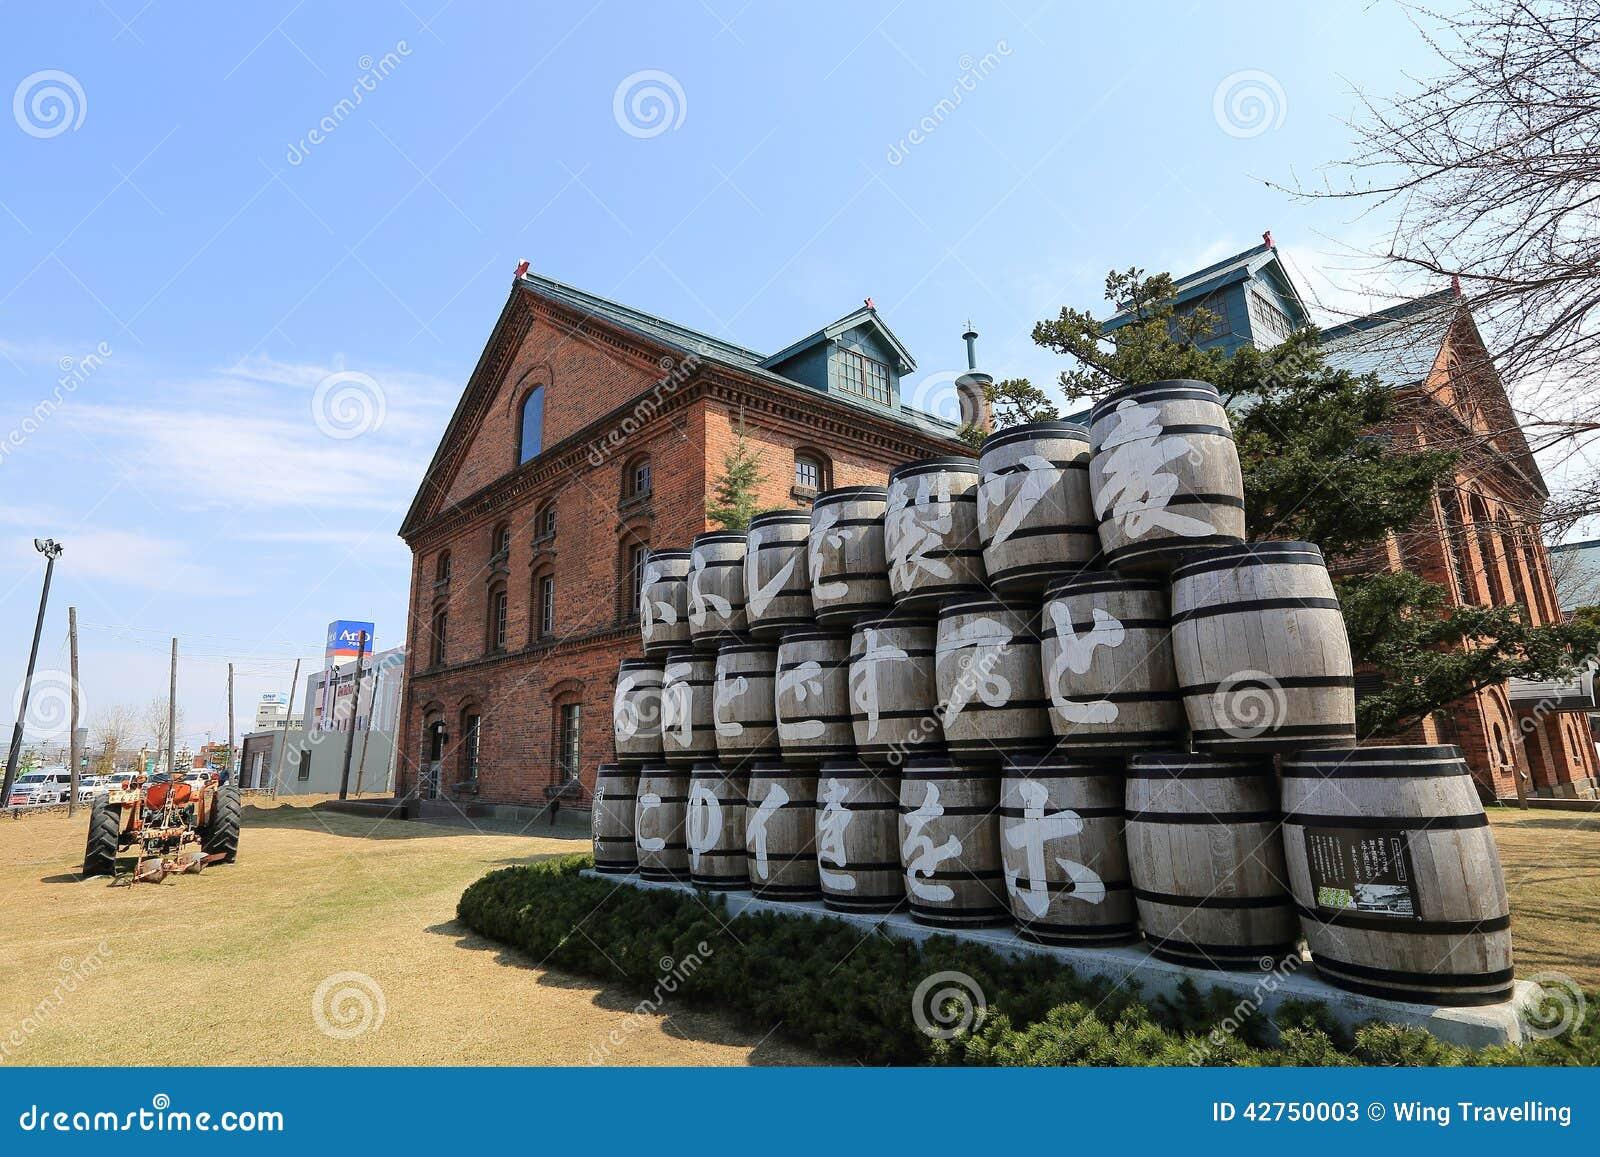 Sapporo Beer Company